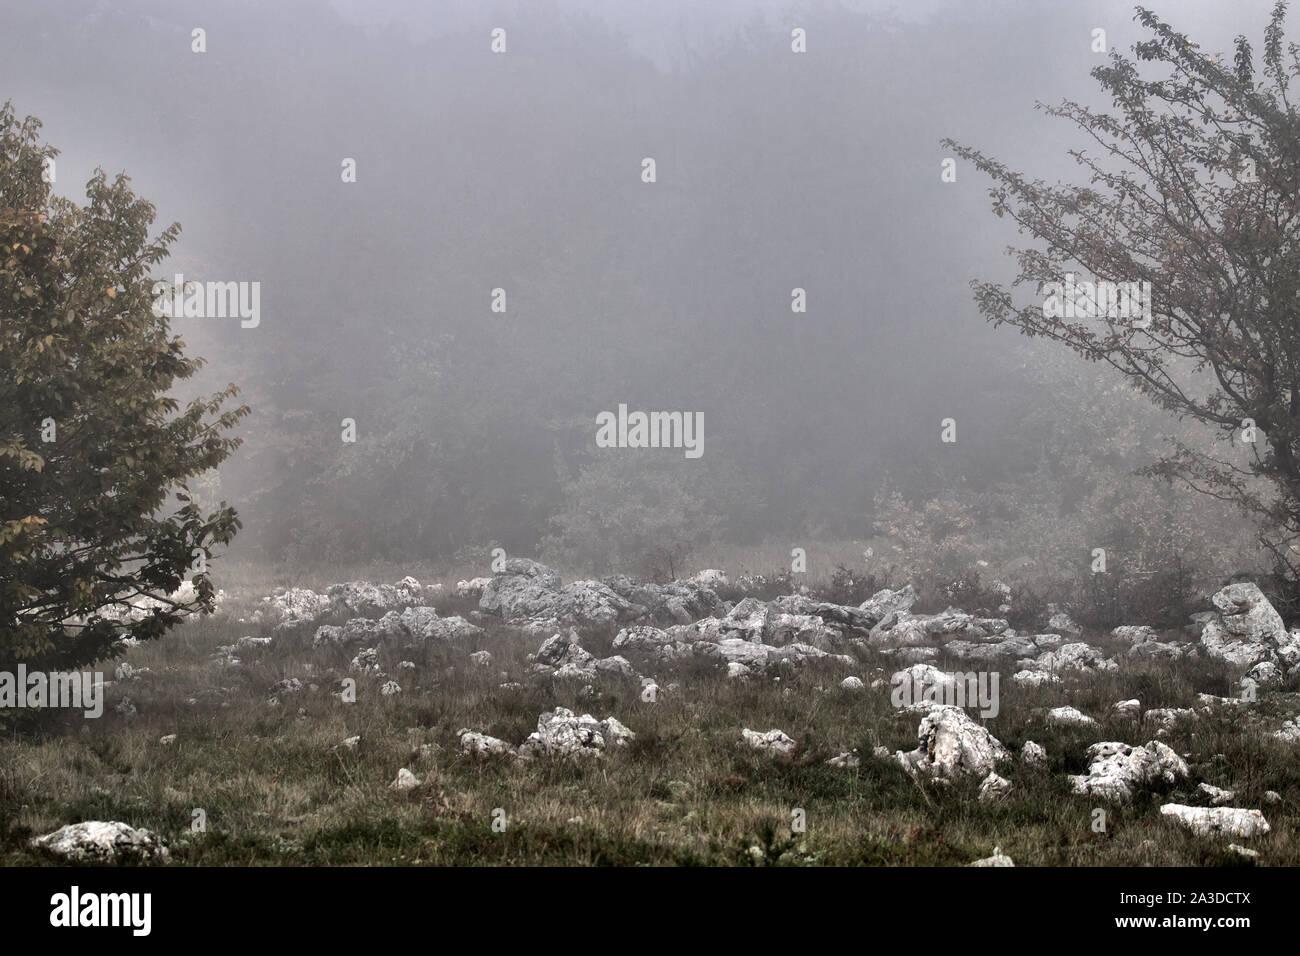 Mountain areas and Alpine meadows in fog, misty mountain Stock Photo